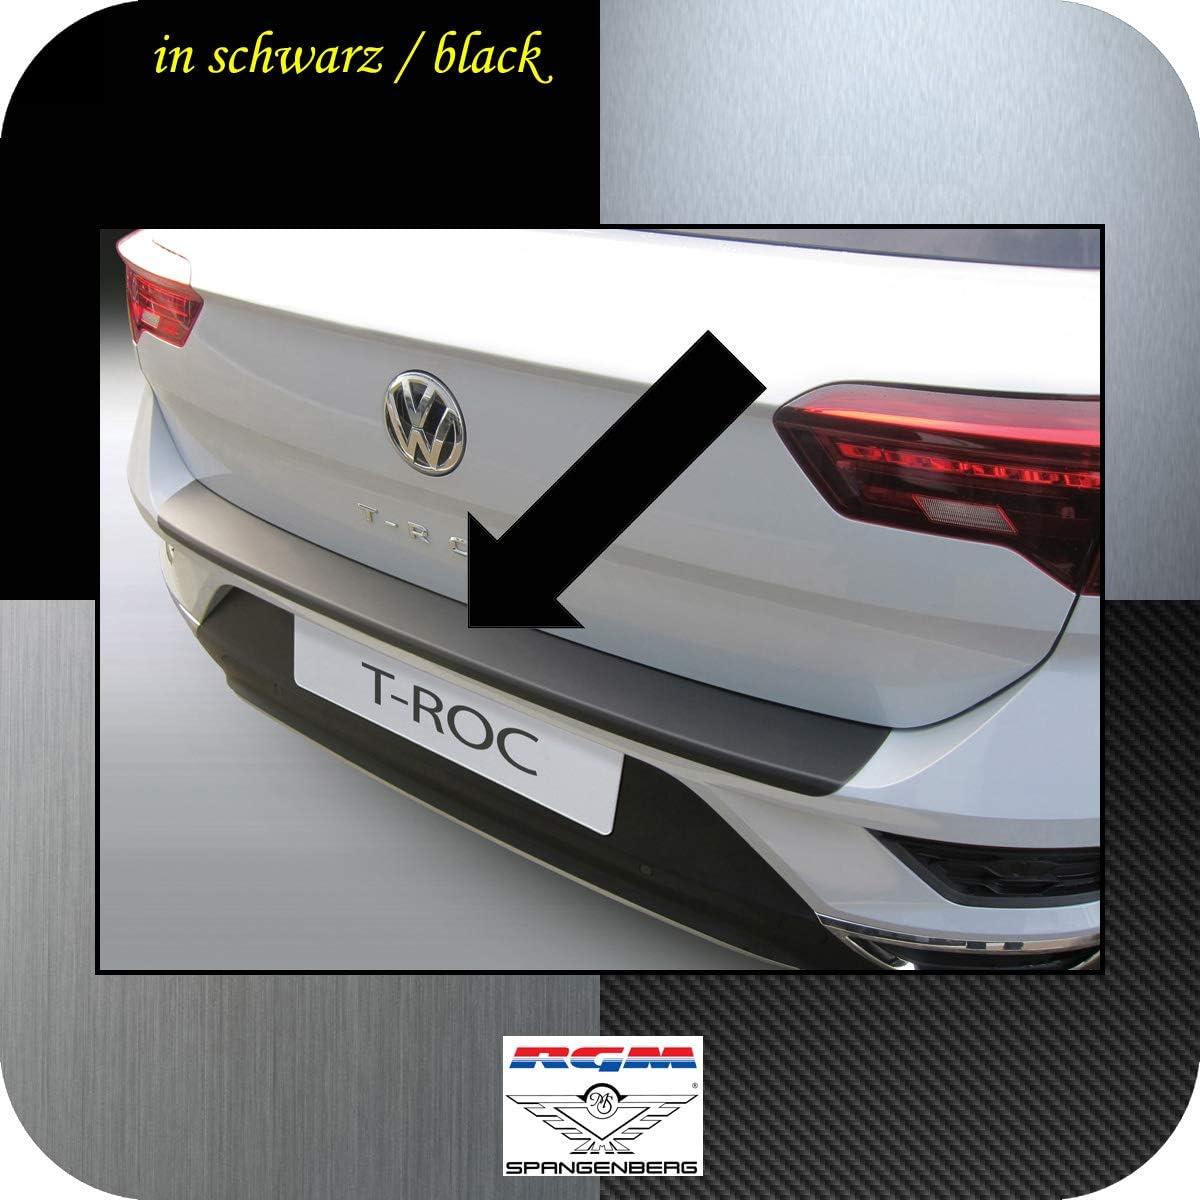 Original RGM Ladekantenschutz schwarz f/ür VW T-ROC SUV Kombi ab Baujahr 11.2017 Richard Grant Mouldings Ltd RBP632